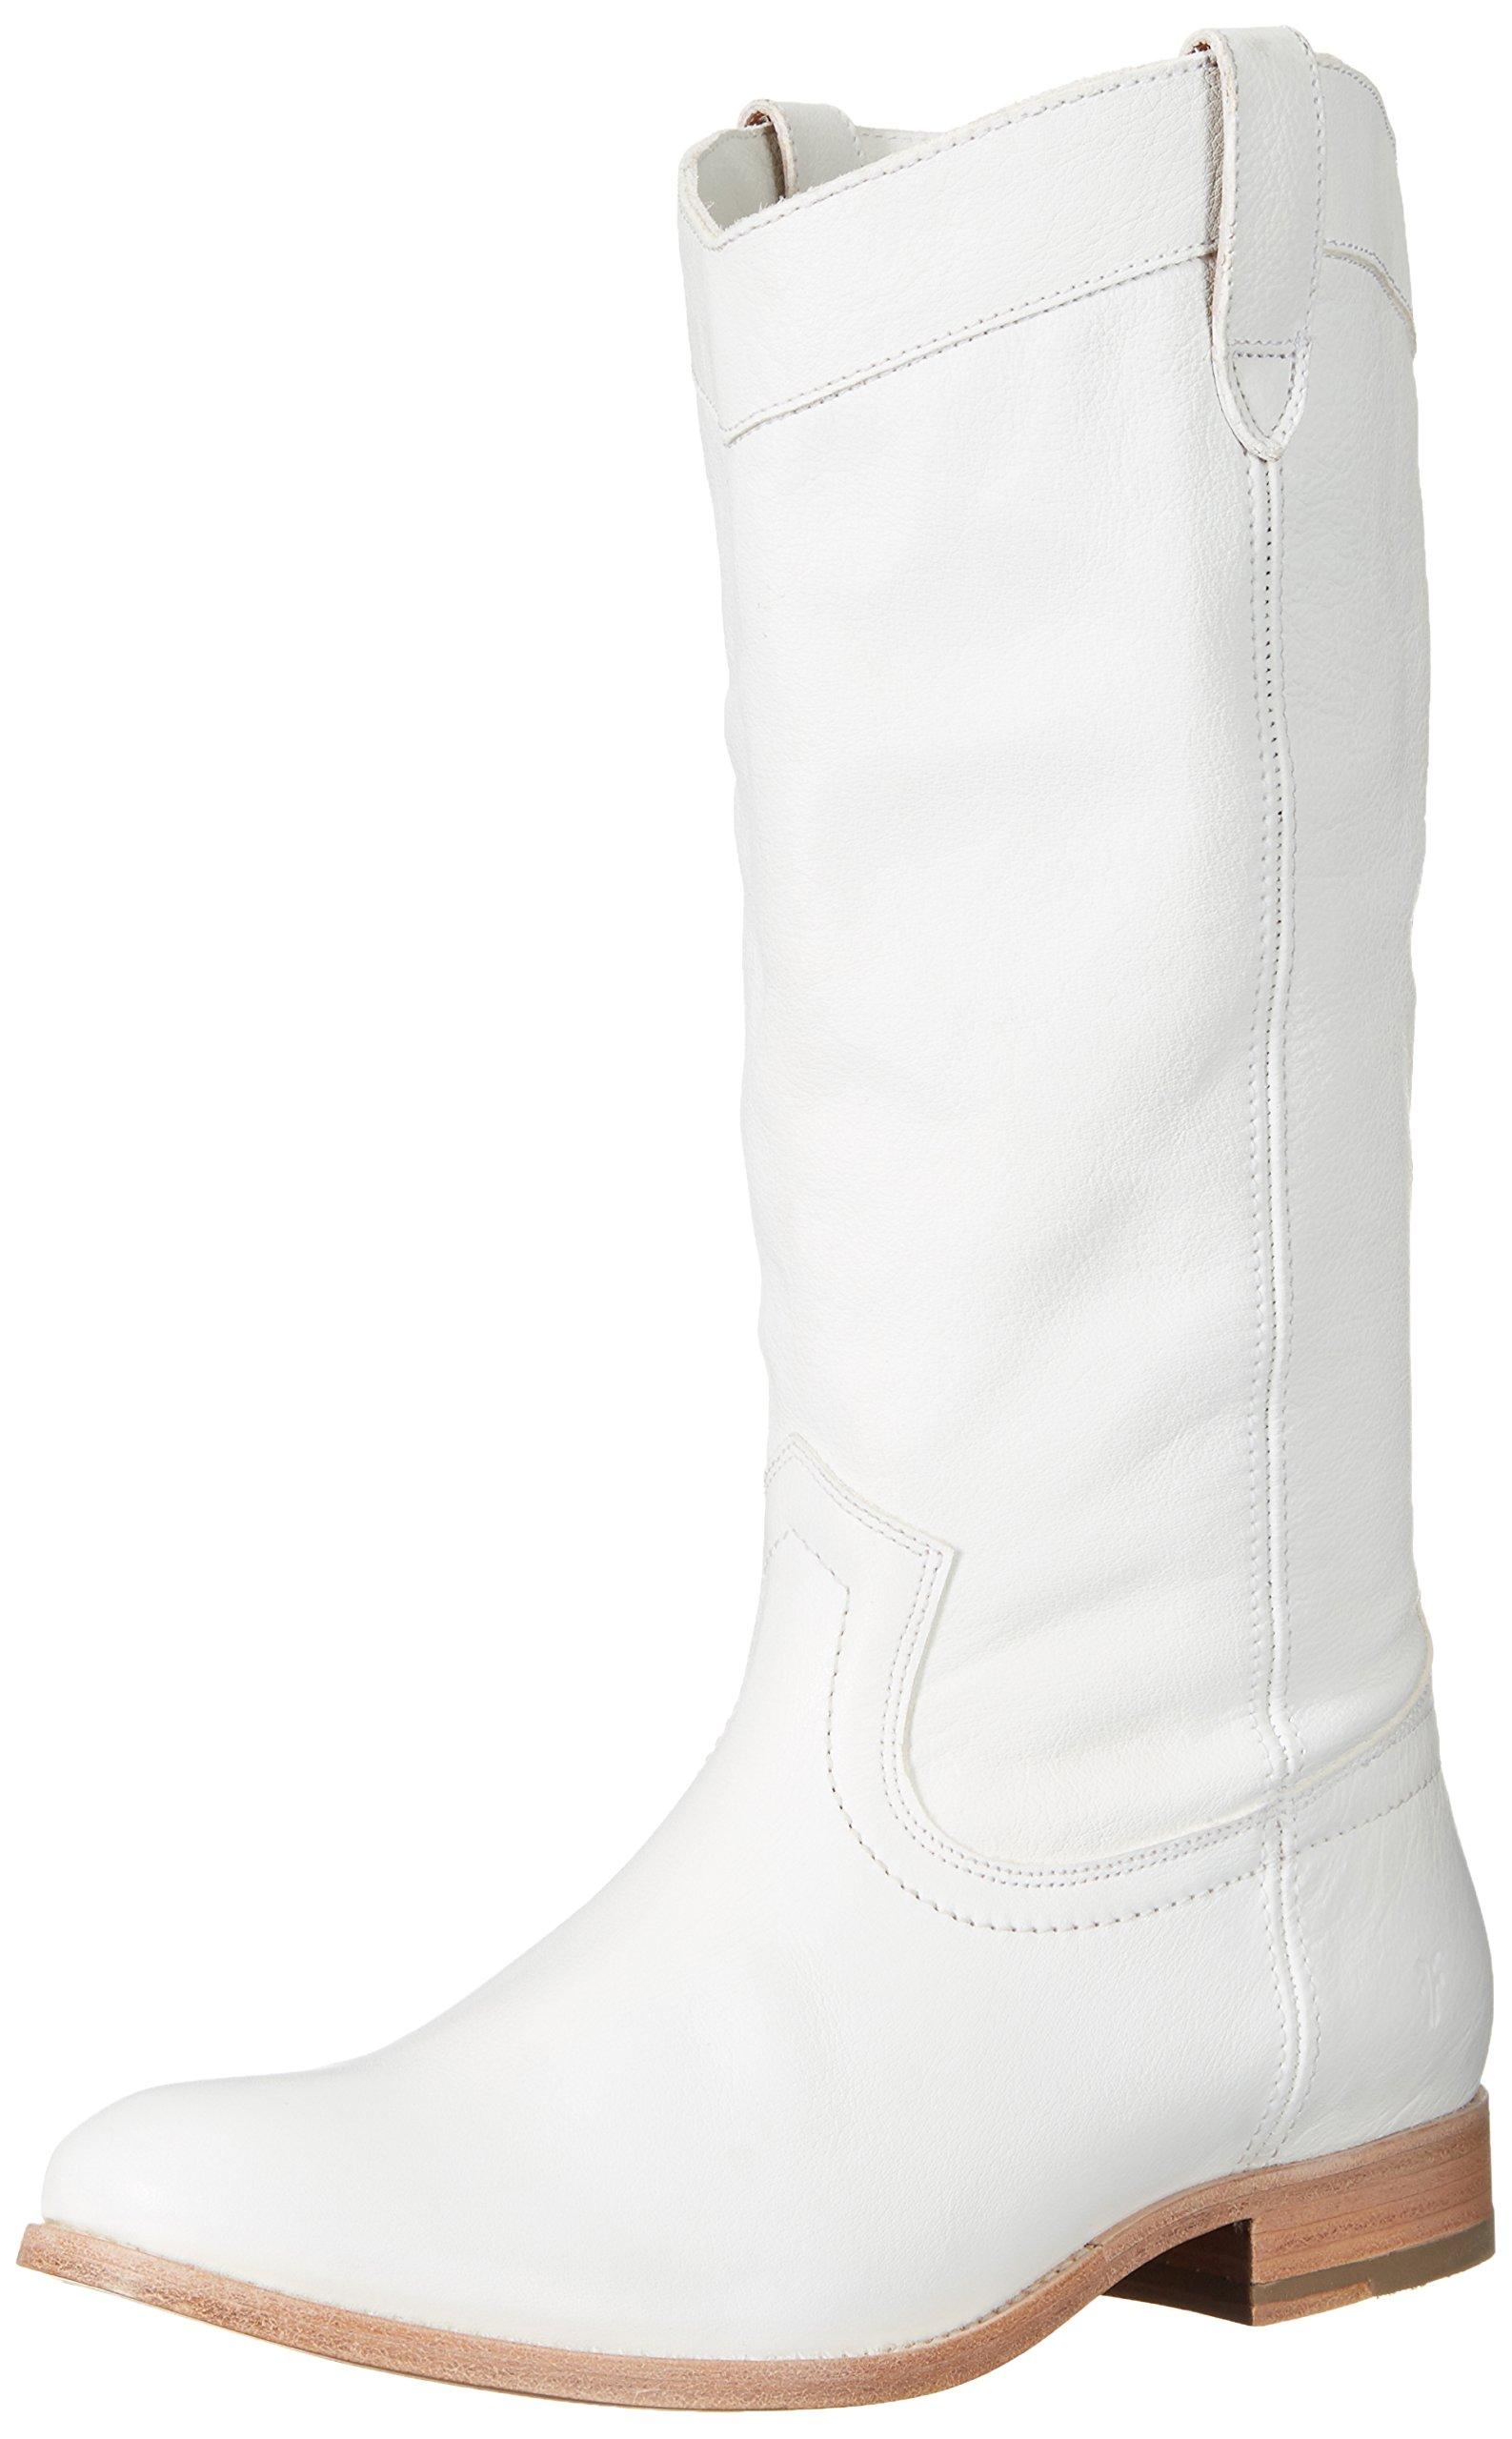 FRYE Women's Melissa Pull On Fashion Boot, White, 6 M US